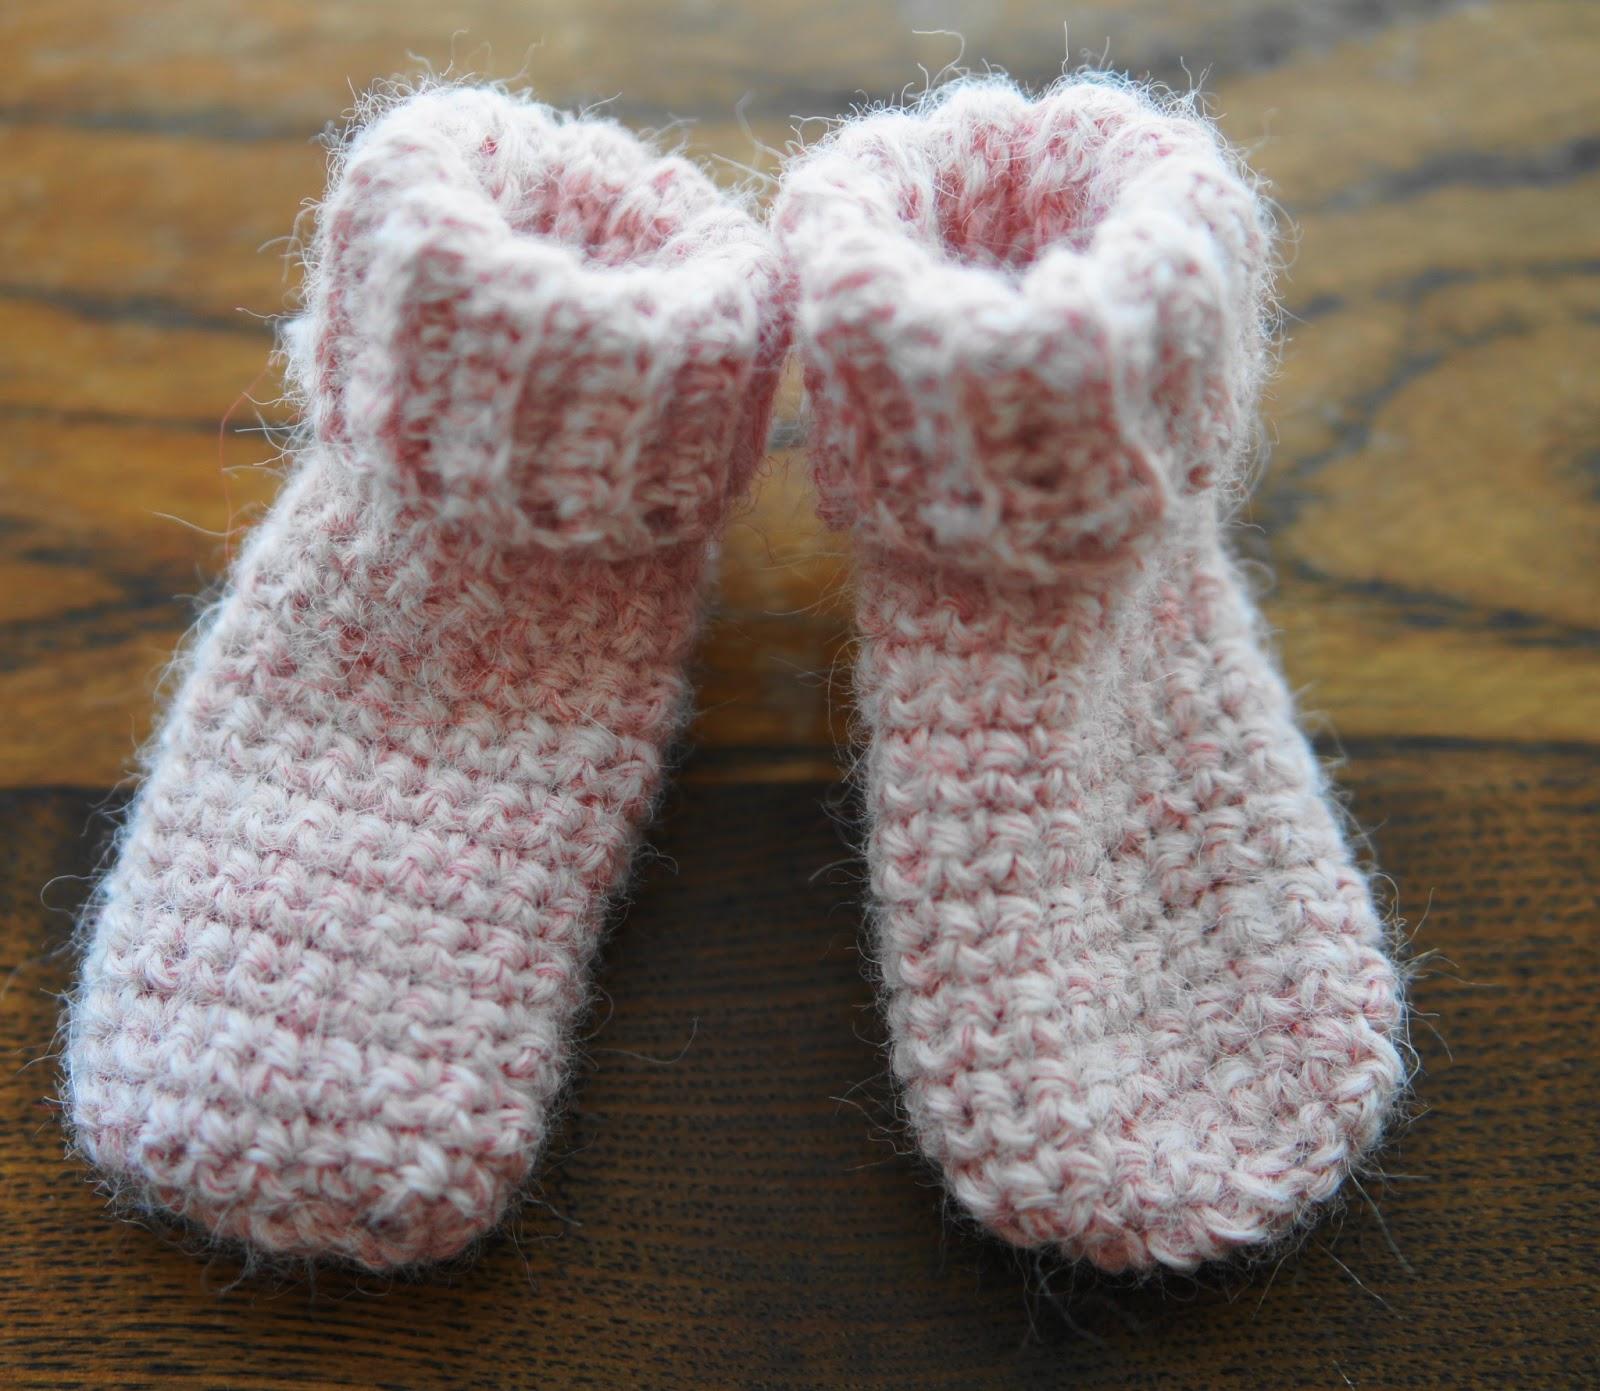 Ball Hank N Skein Newborn Baby Sock Crochet Pattern